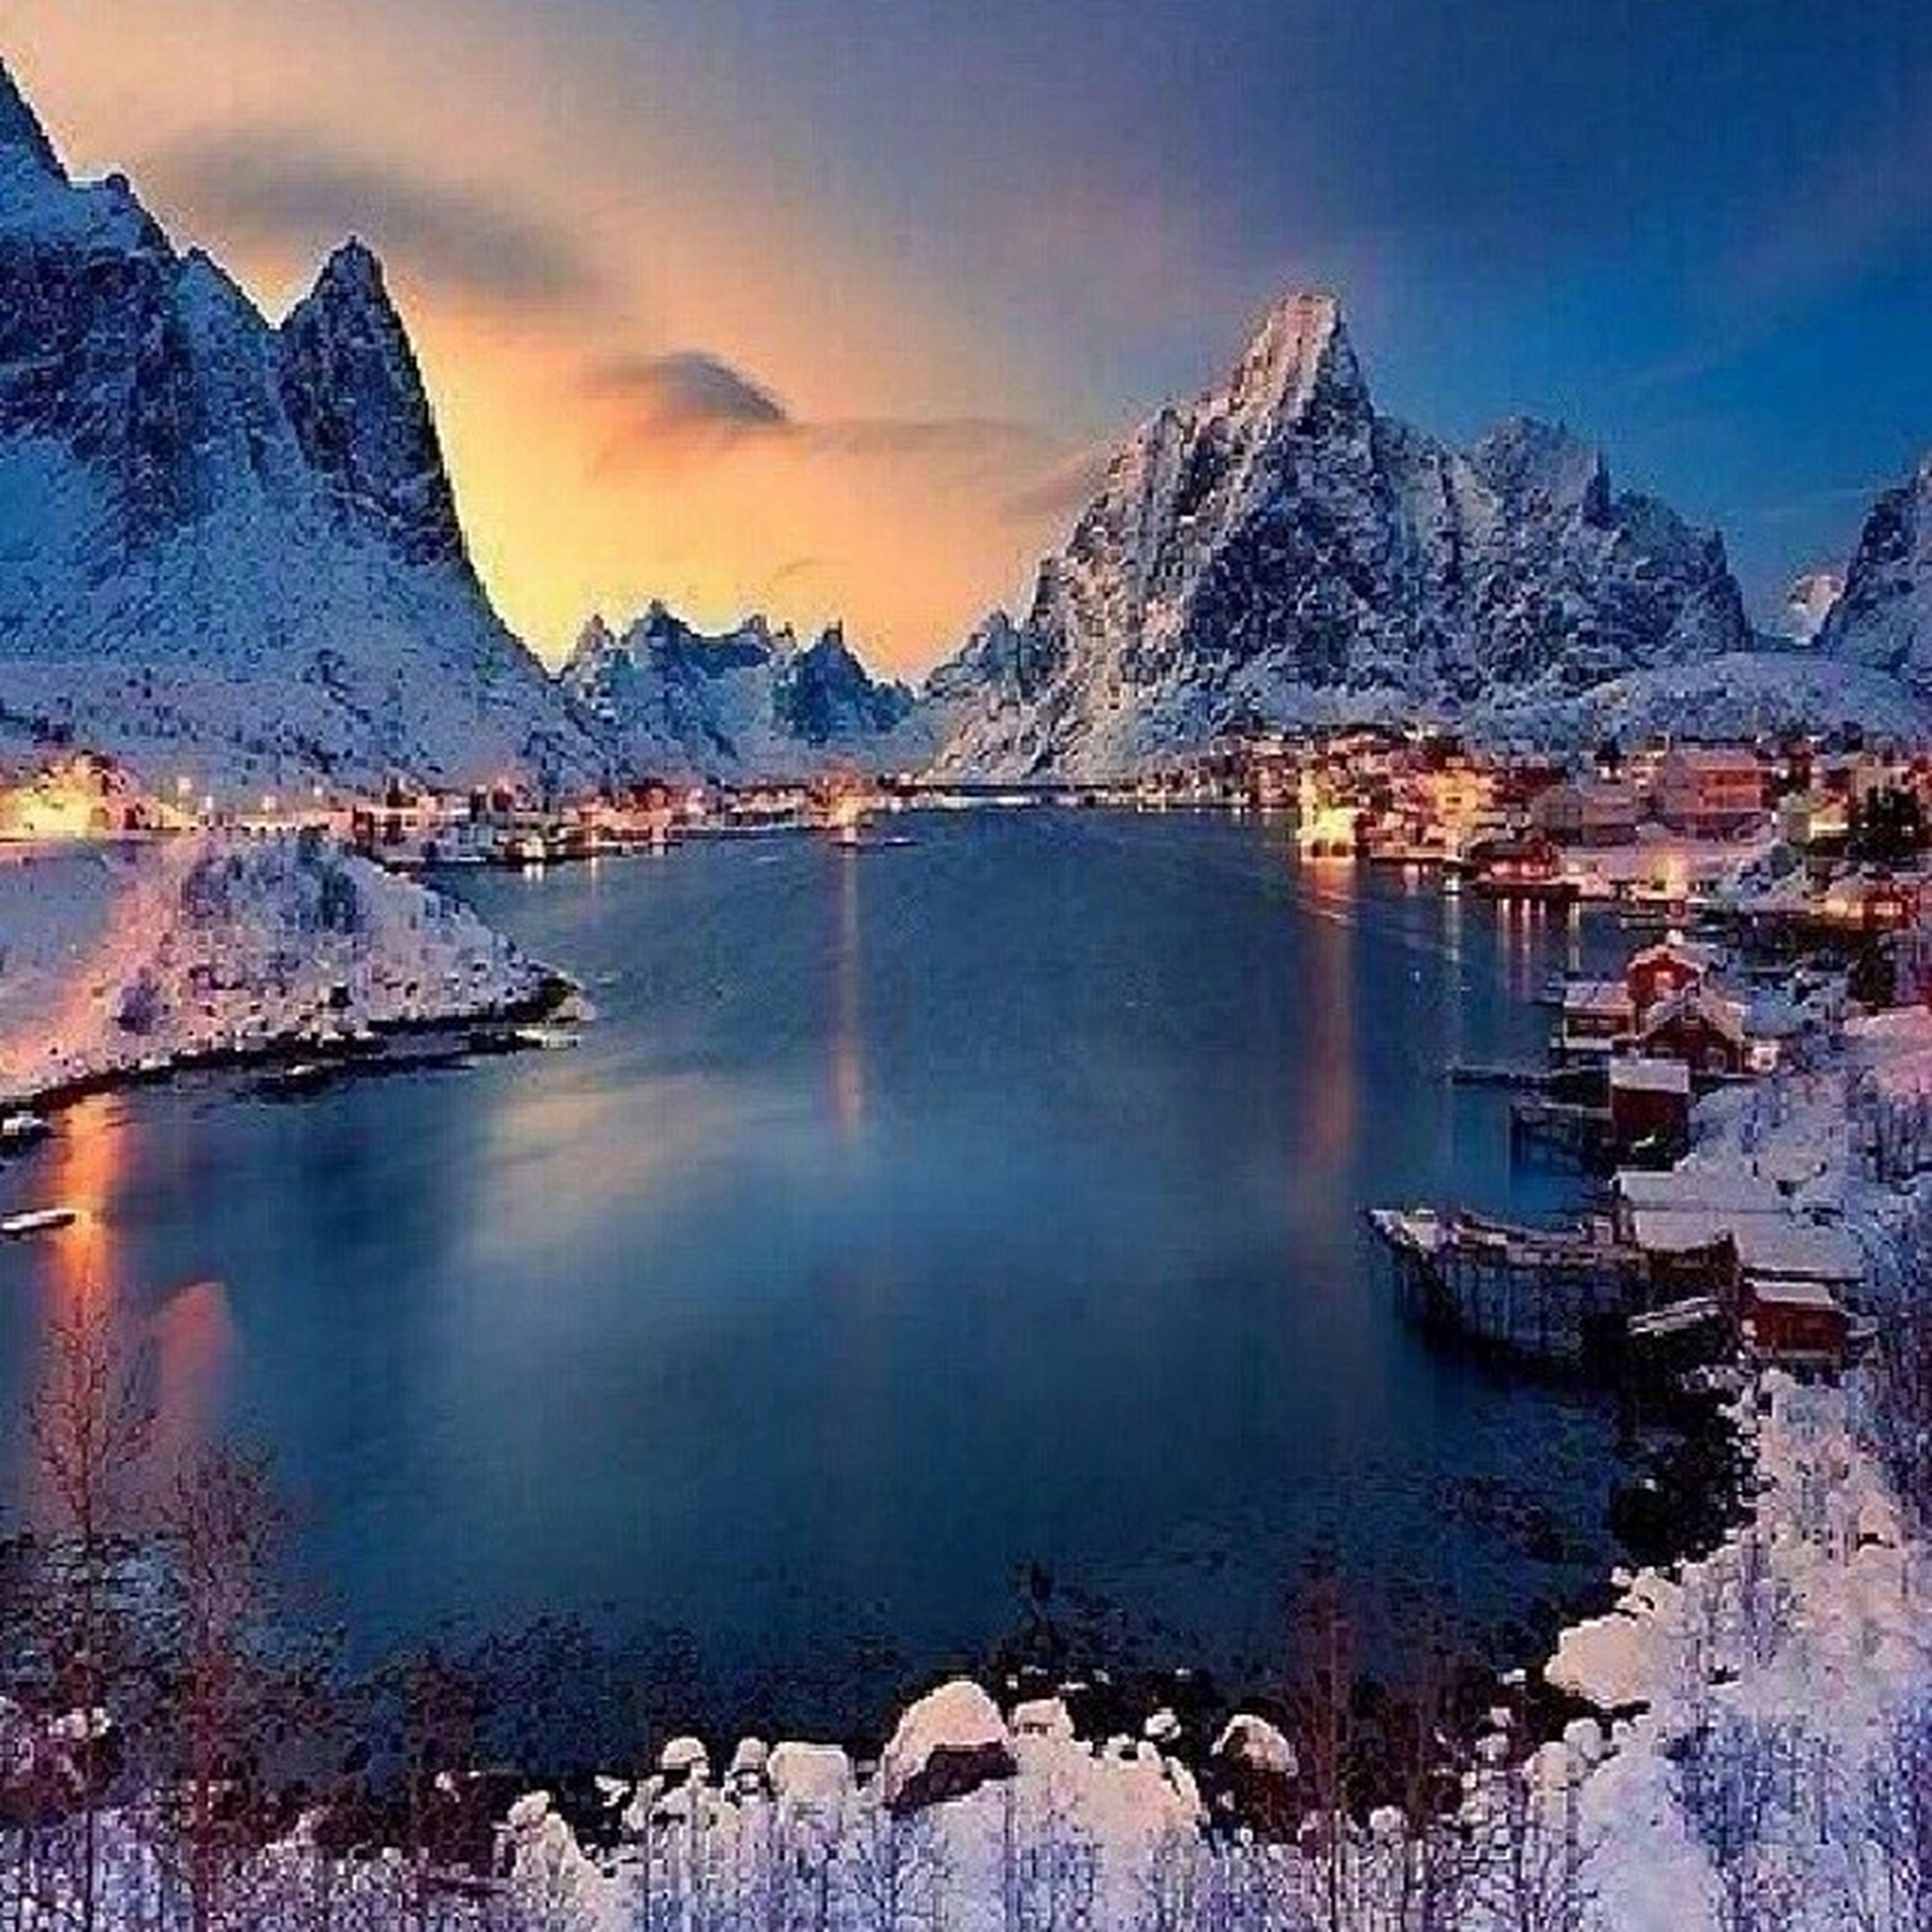 mountain, mountain range, water, winter, snow, cold temperature, scenics, sky, lake, tranquil scene, beauty in nature, snowcapped mountain, tranquility, reflection, season, nature, weather, panoramic, idyllic, cloud - sky